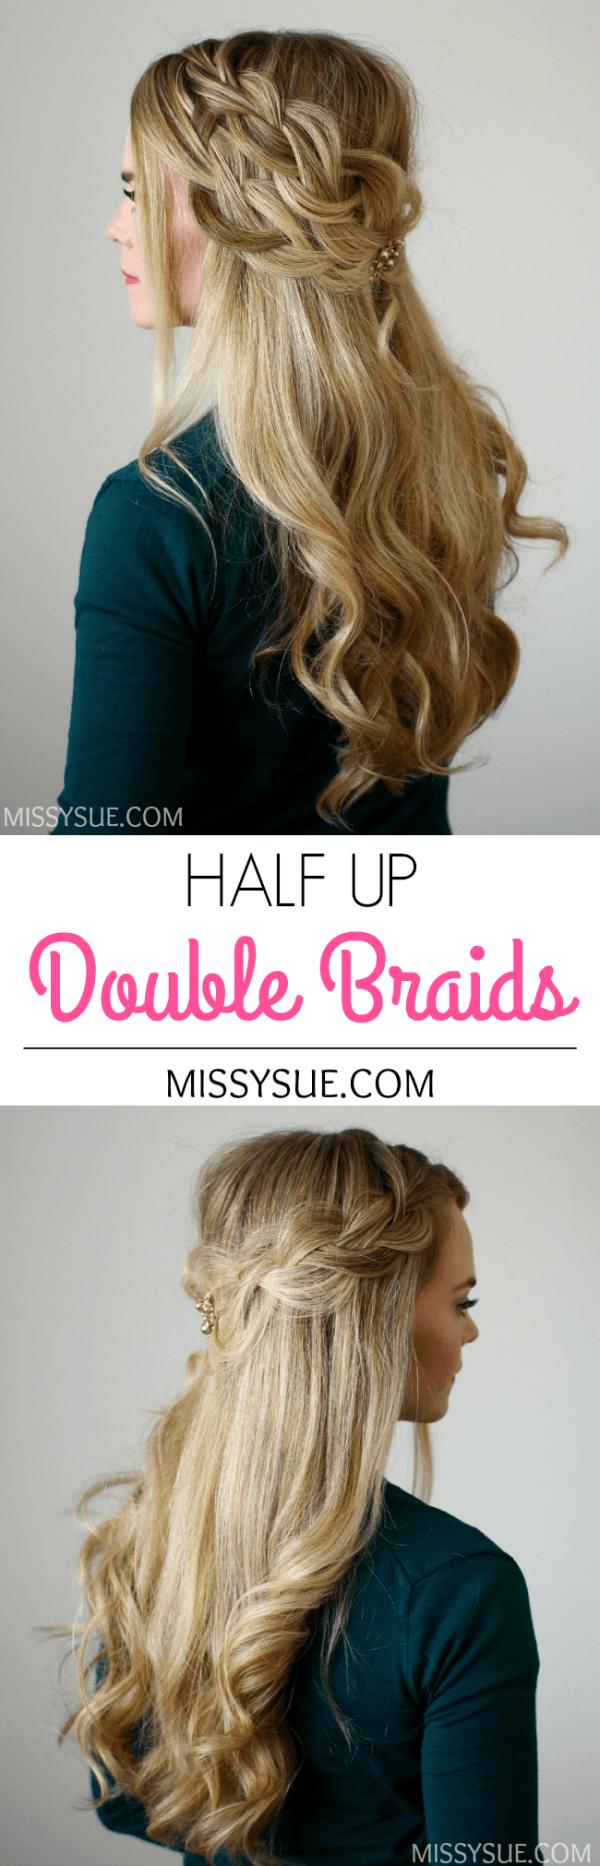 Half up double braids hairstyles pinterest